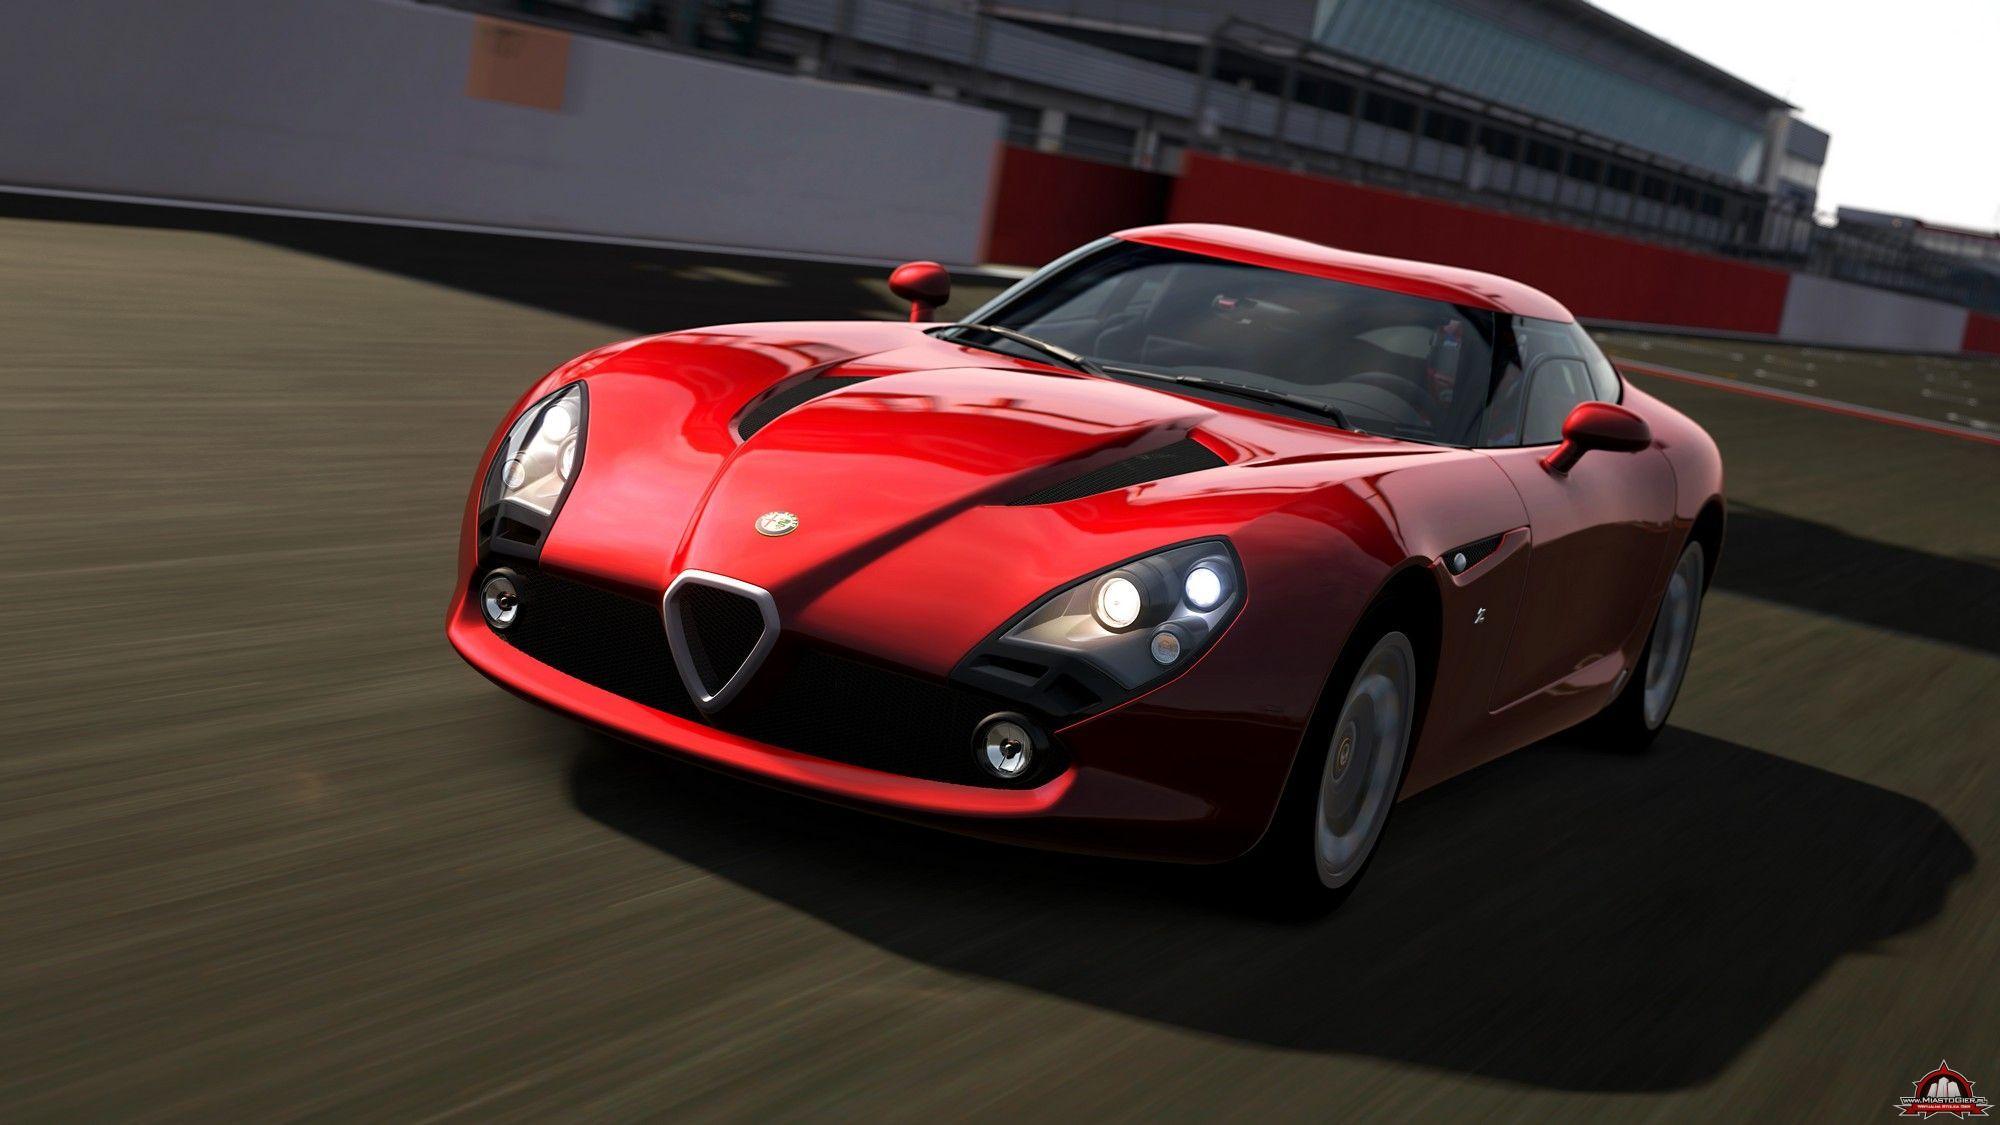 nws_gran_turismo6_001 Remarkable Lotus Carlton Gran Turismo 5 Cars Trend